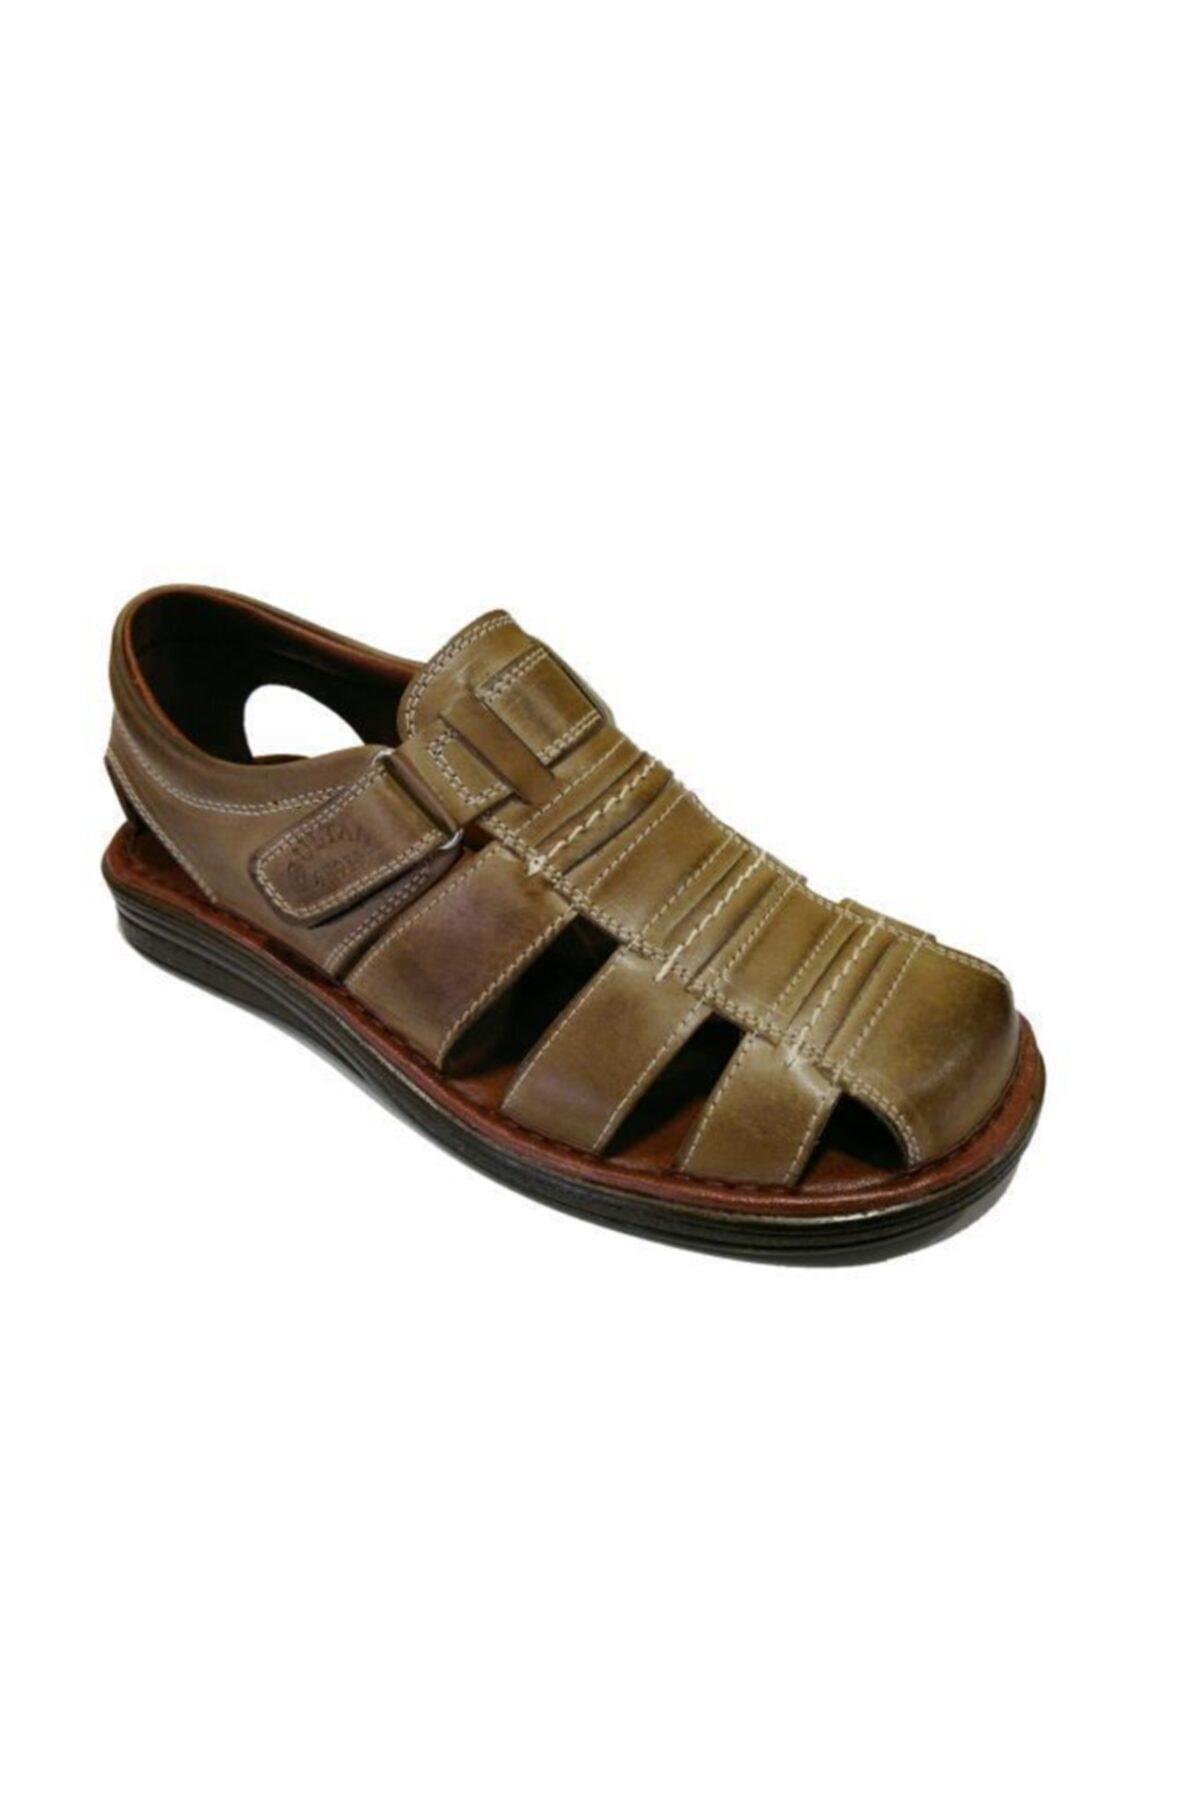 Sultan 212 Hakiki Deri Erkek Sandalet 1